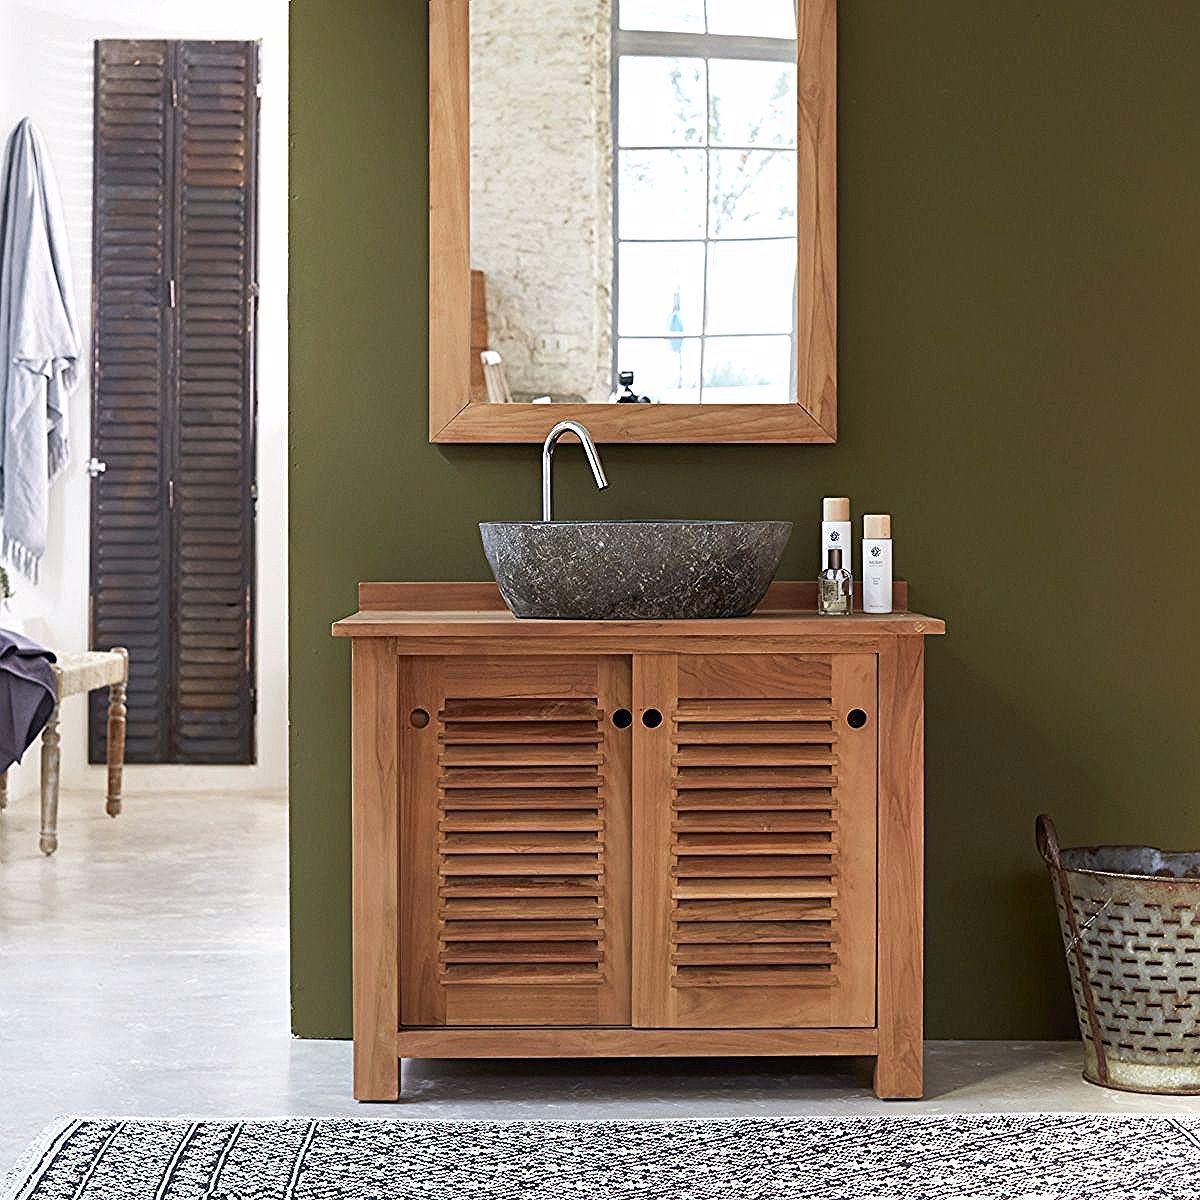 Solid Teak Wood Vanity Cabinet Wash Stand Modern Design Bathroom Furniture In 2020 Teak Bathroom Brown Bathroom Decor Green Bathroom Decor